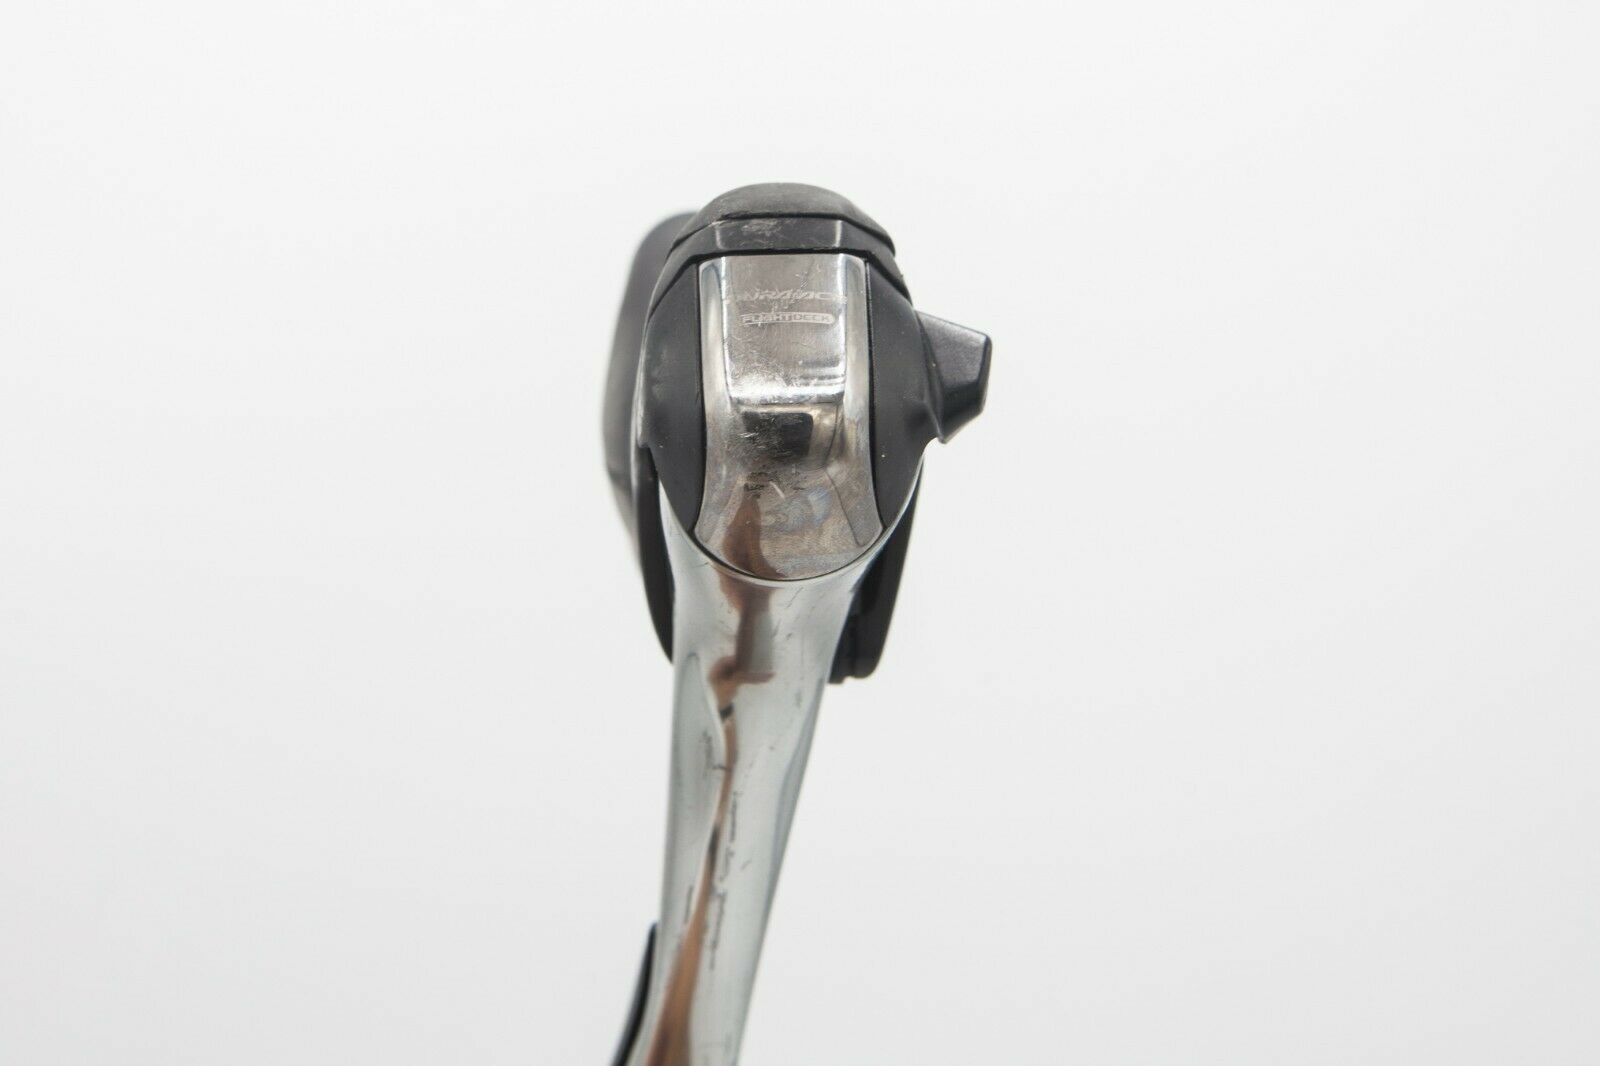 Shimano STI Bremsschalthebel Dura-Ace ST-7800 rechts 10-Fach